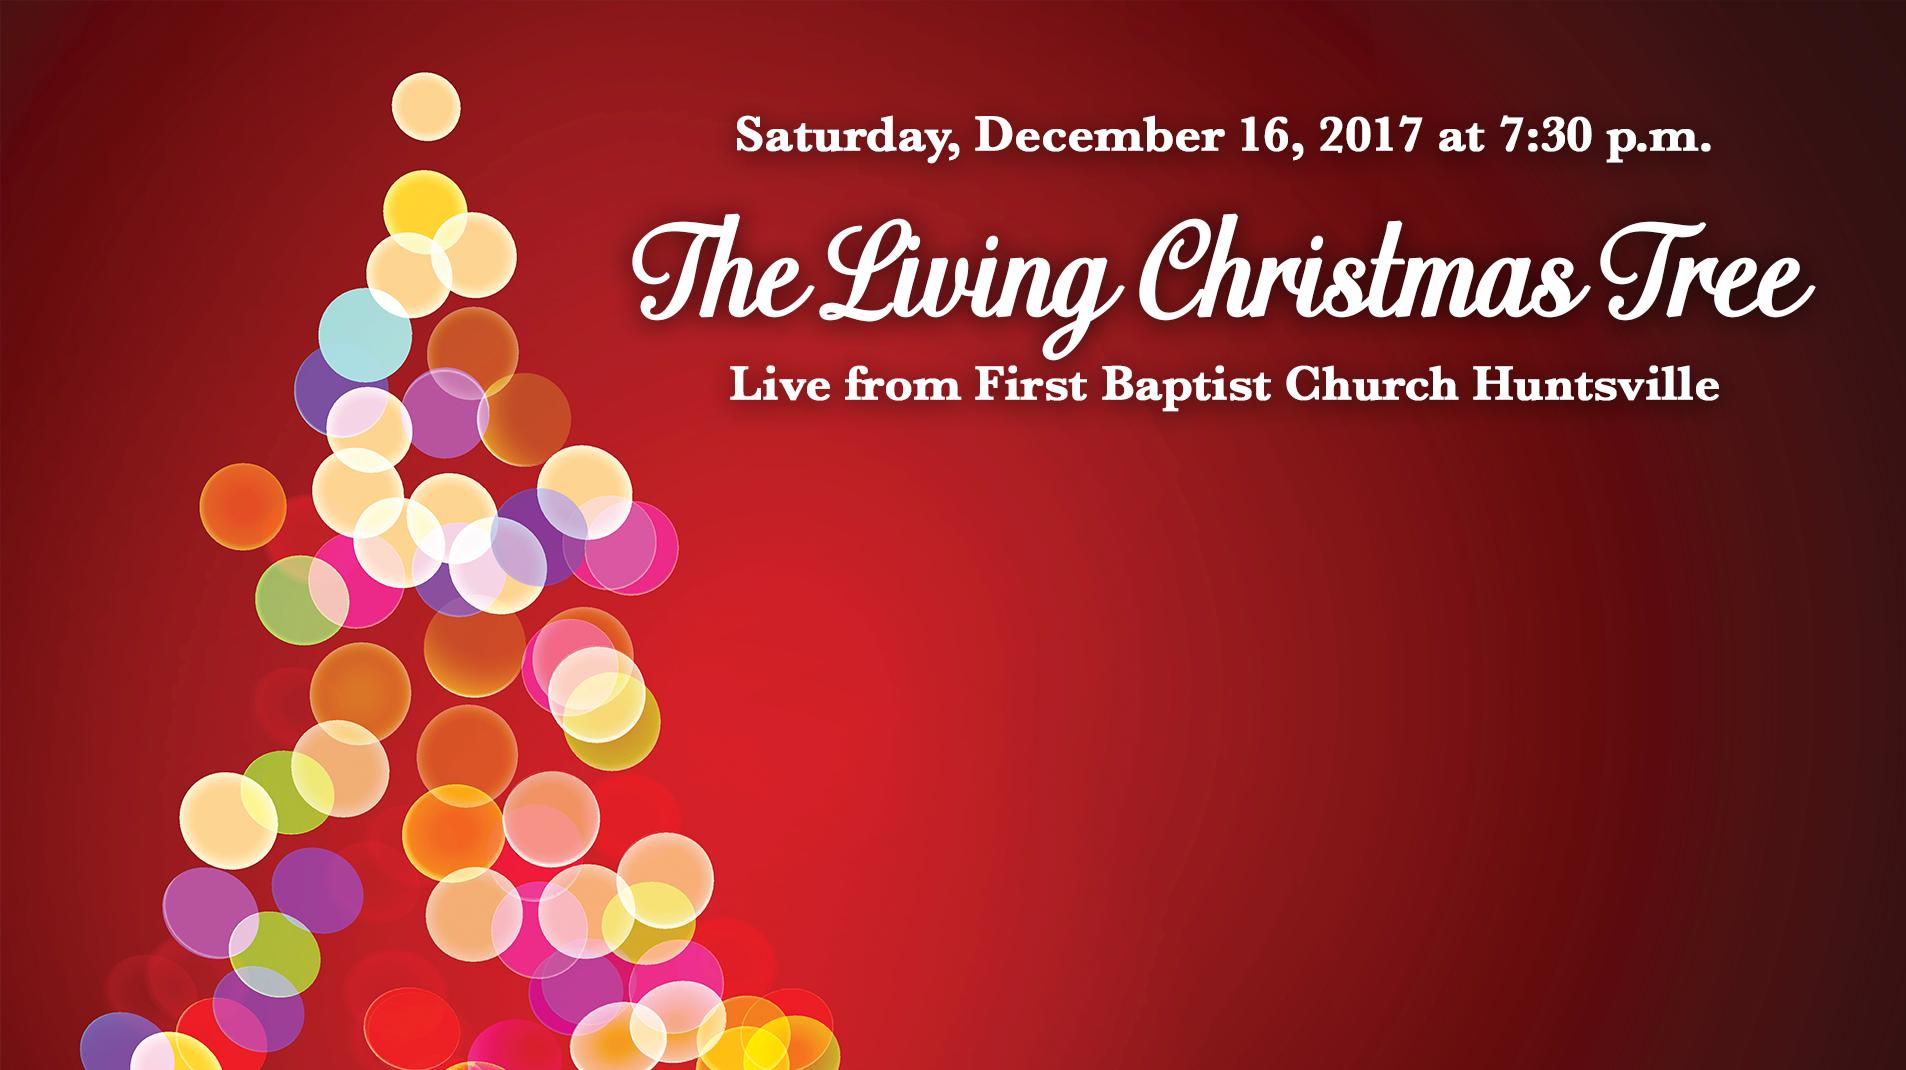 First Baptist Huntsville Al Living Christmas Tree 2021 Livestream Living Christmas Tree 2017 Saturday On Livestream